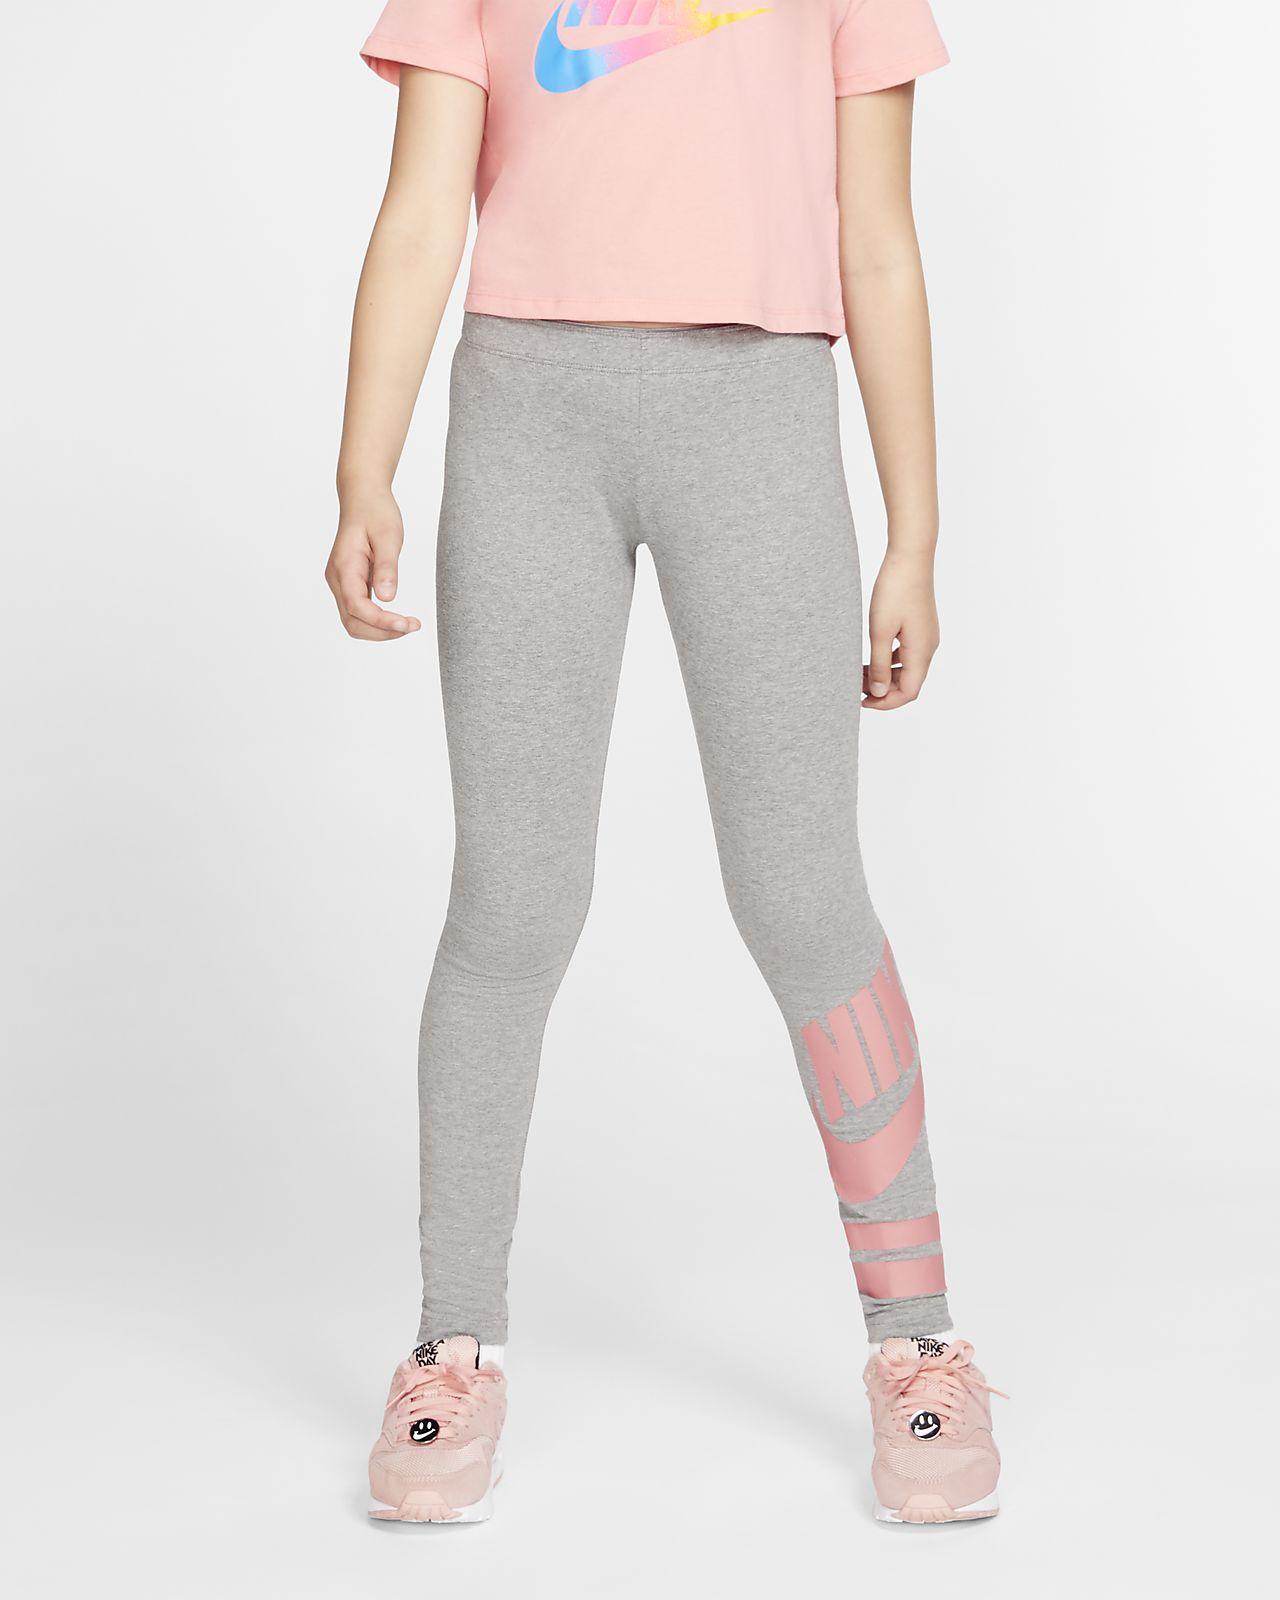 Nike Sportswear Older Kids' (Girls') Graphic Leggings